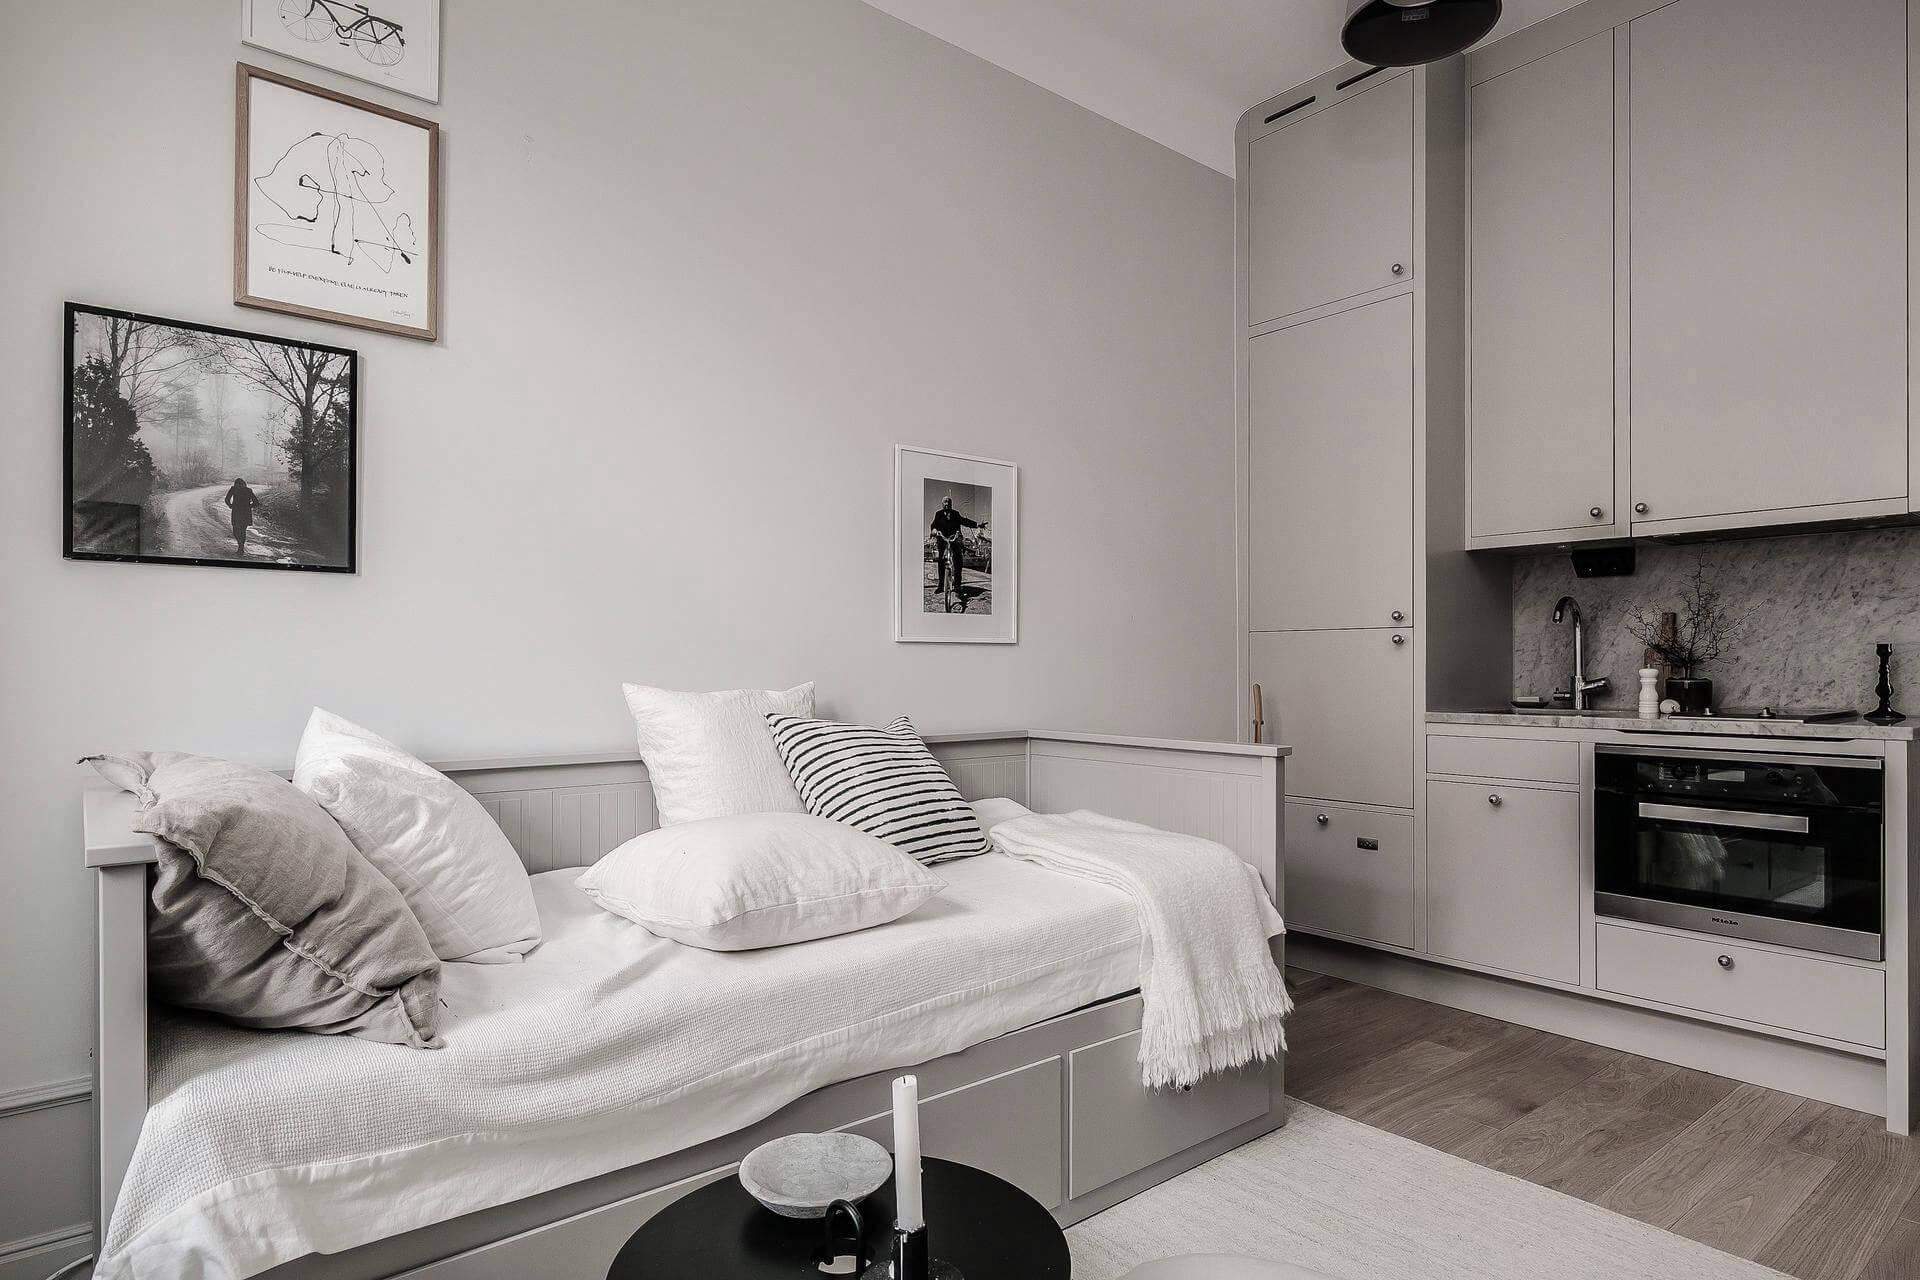 Дизайн квартиры-студии 20 кв. м